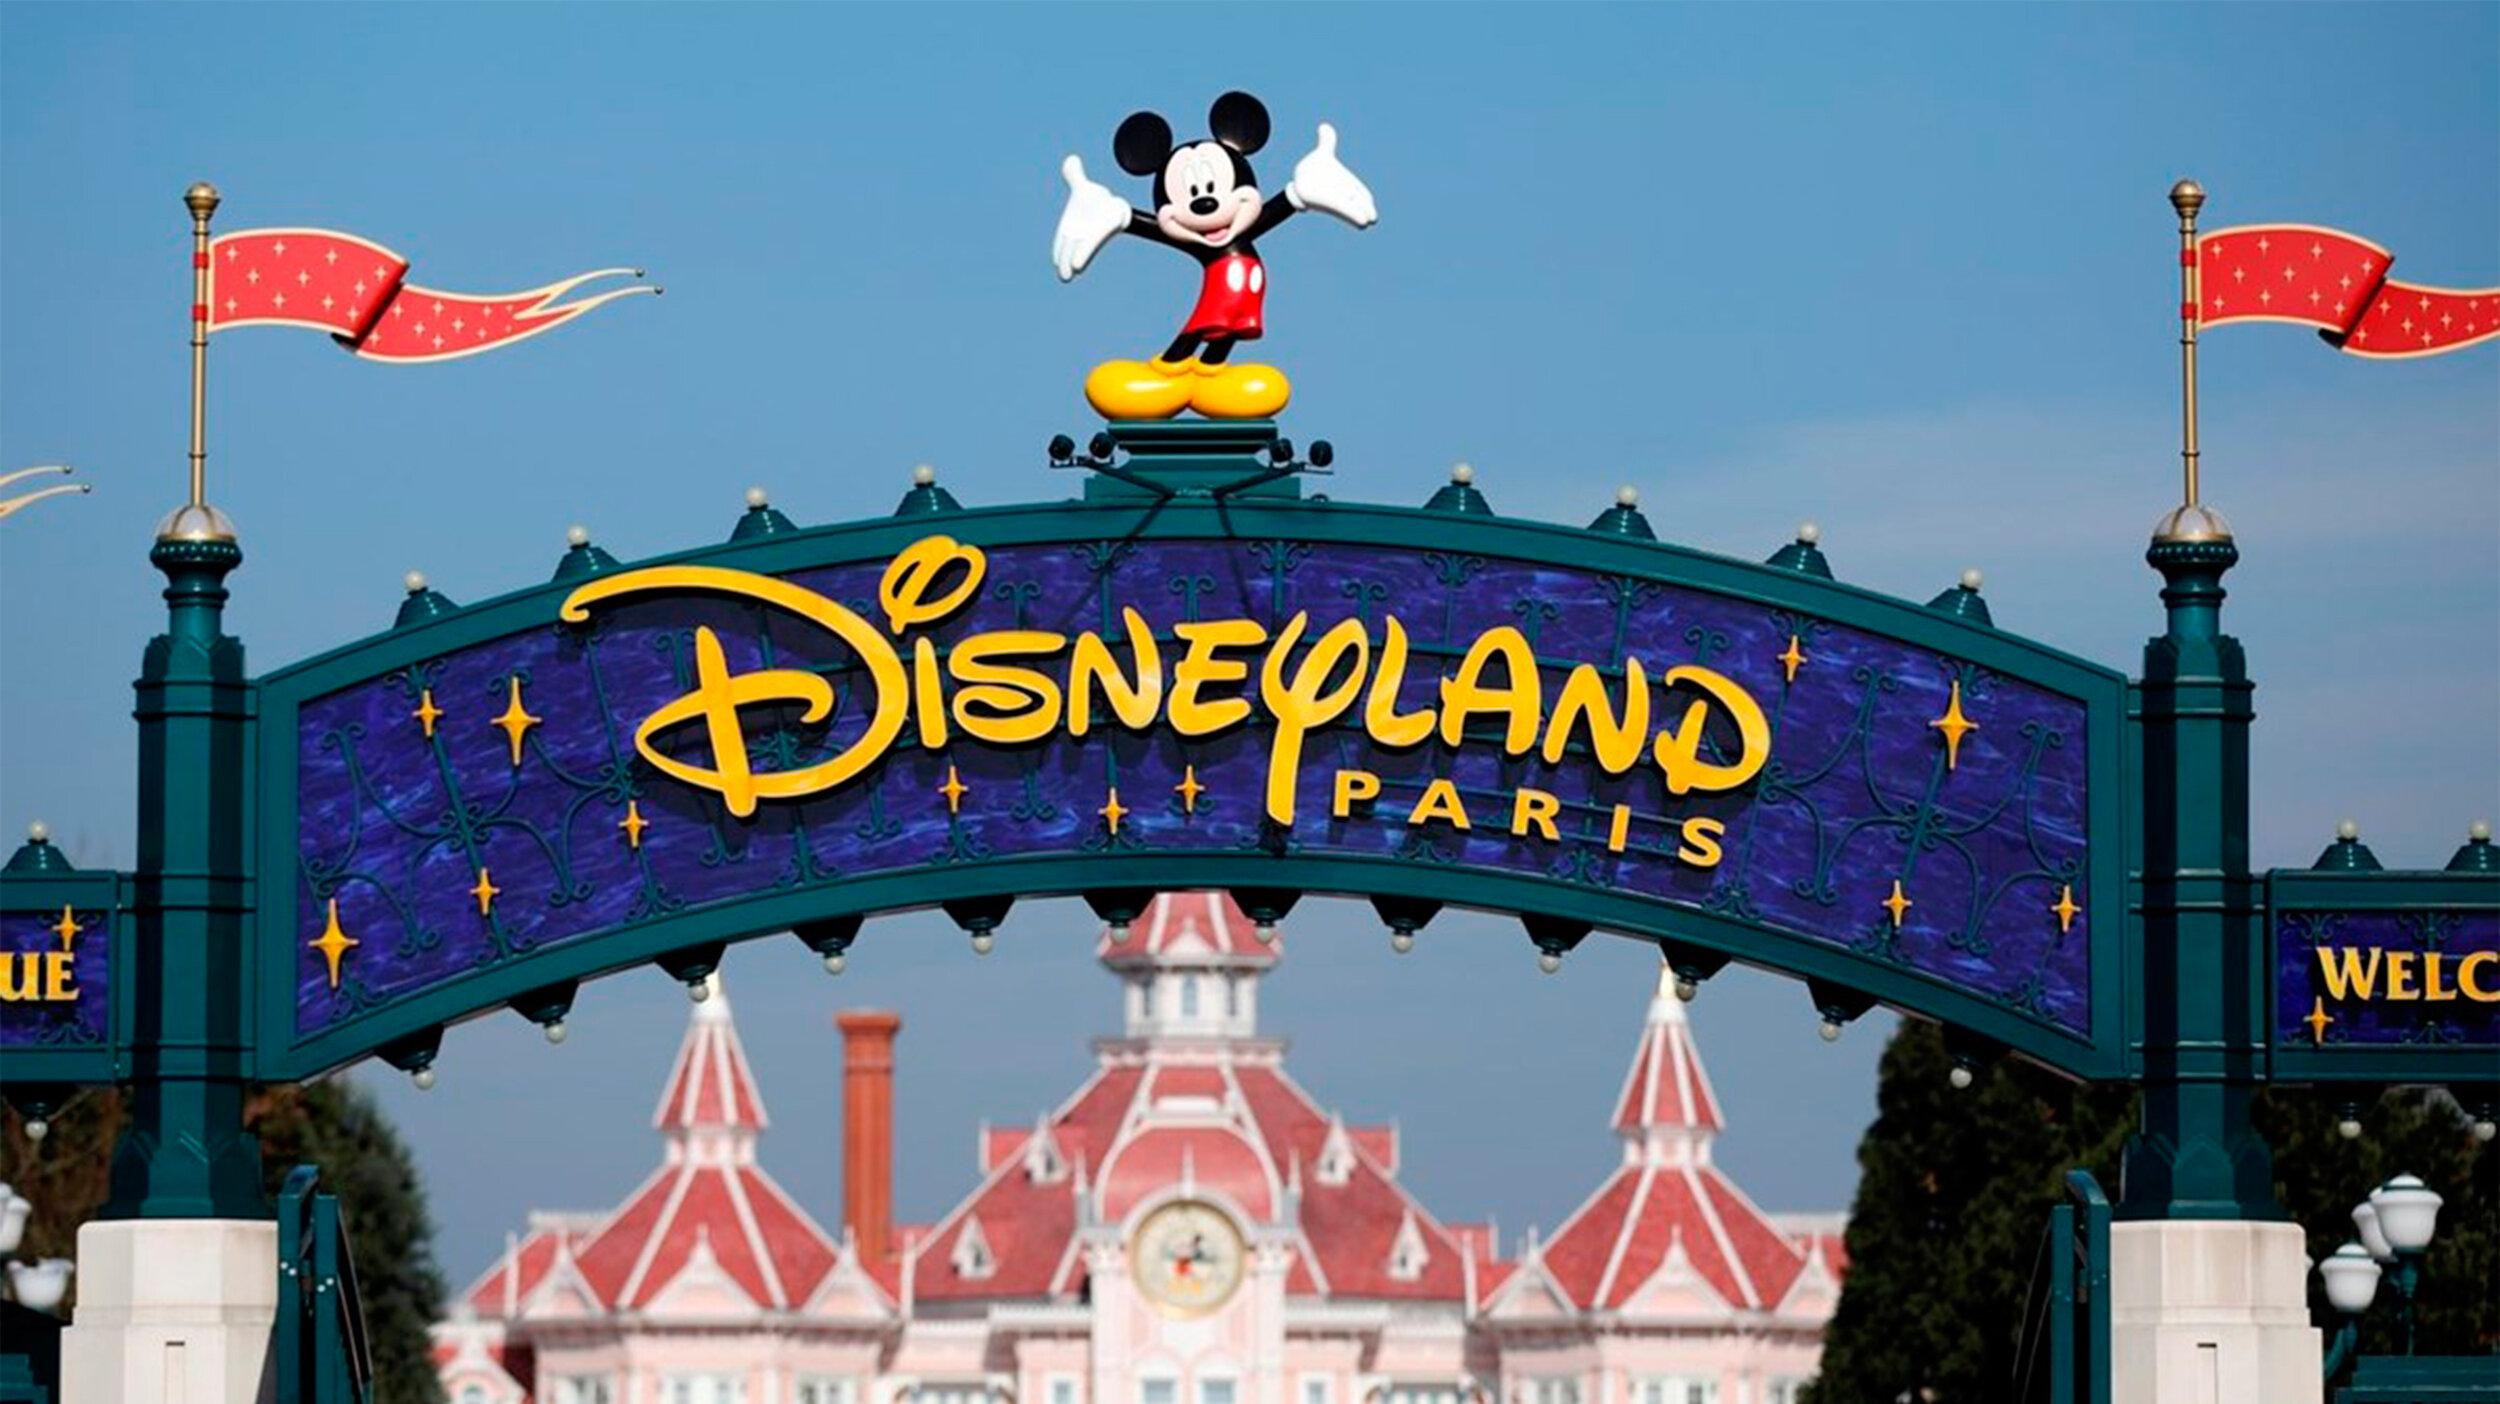 9-Disneyland Paris -